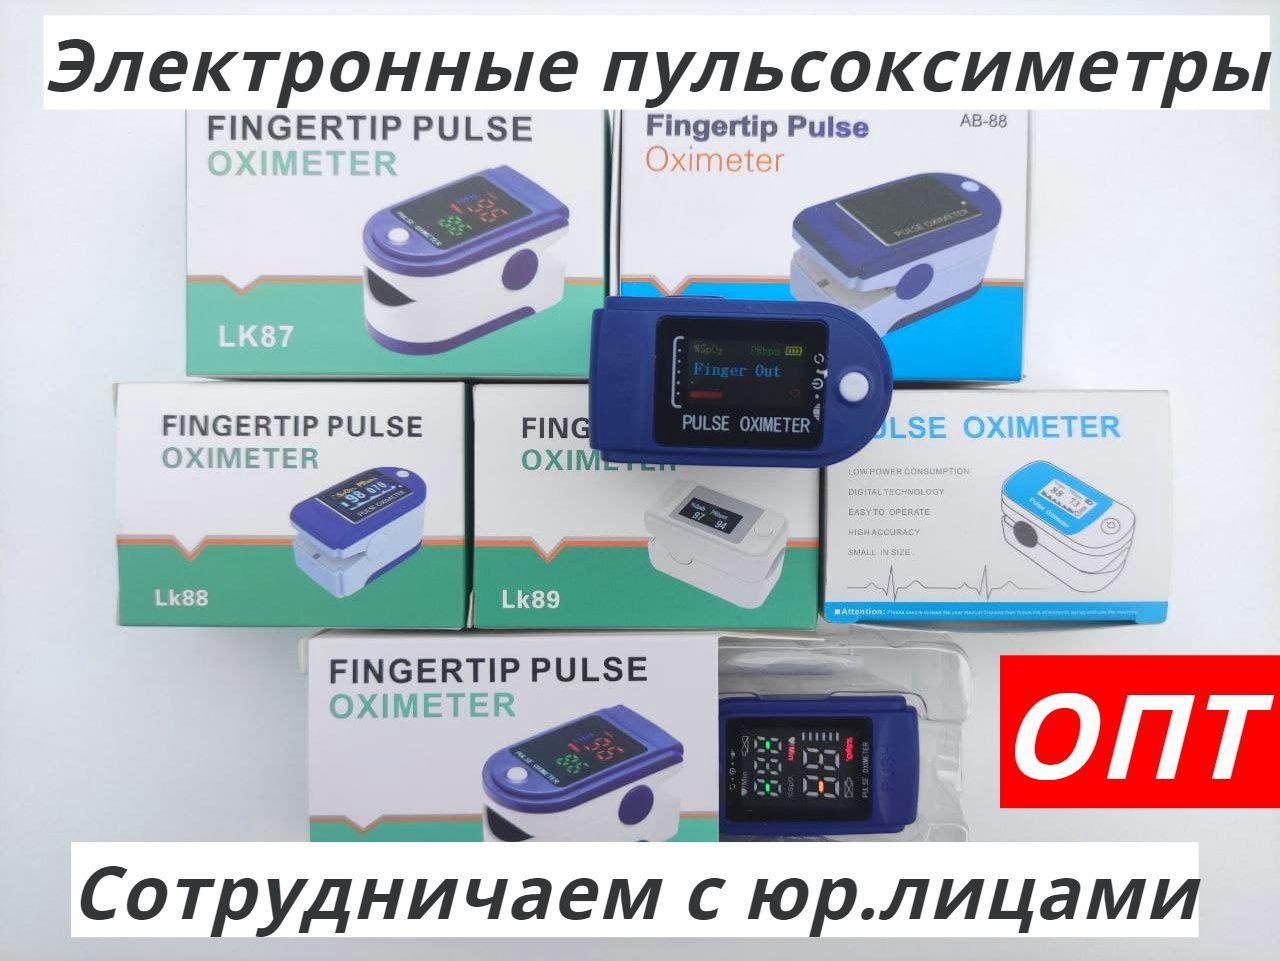 Електронний ПУЛЬСОКСИМЕТР LK87 датчик пульсу кисню в крові медичний на палець пульсометр оксометр